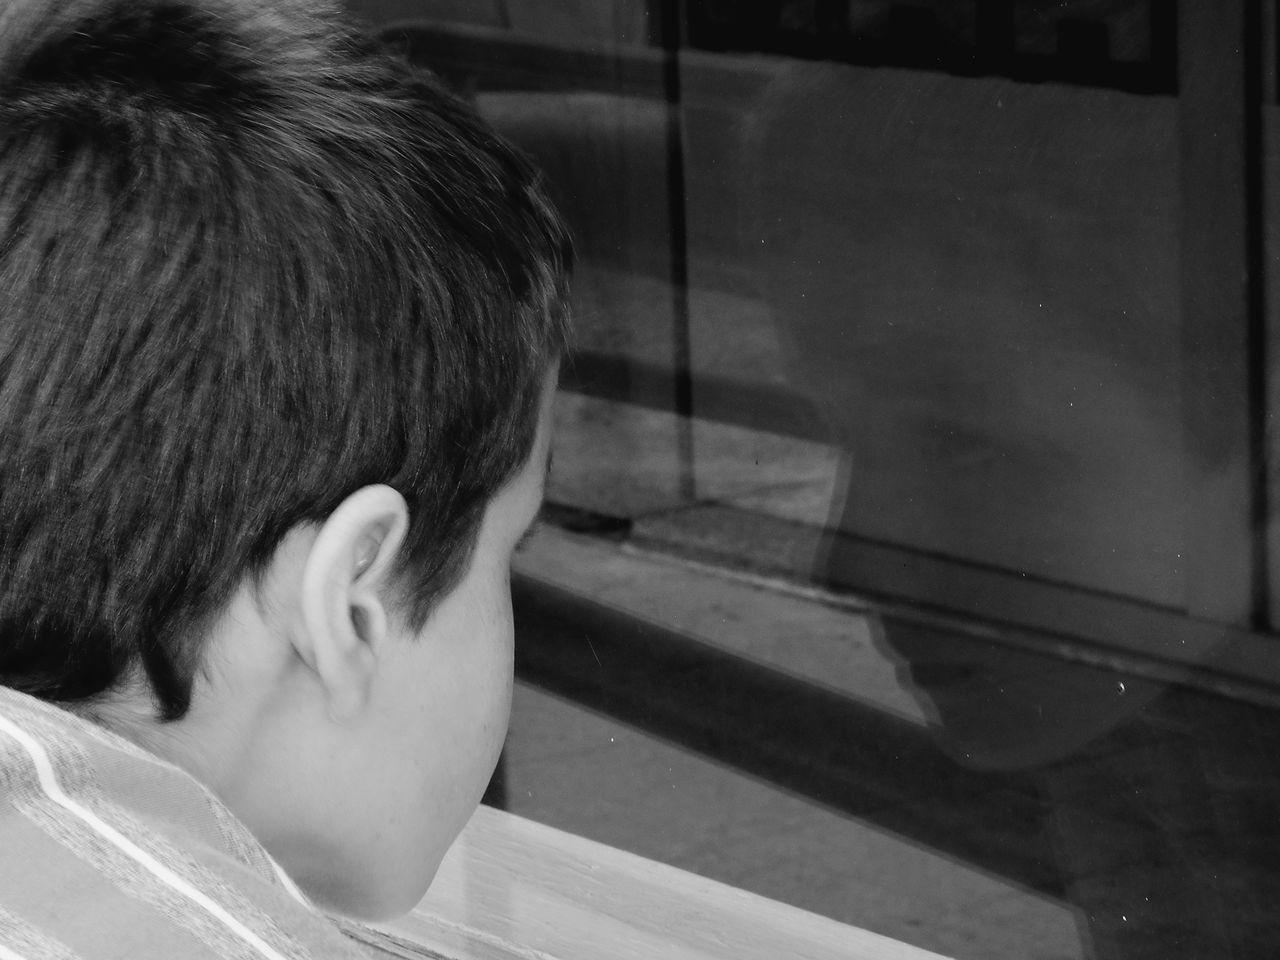 Visual journal May 2017 village of Alexandia, Nebraska A Day In The Life B&W Portrait Camera Work Childhood Close-up Elementary Age Everyday Lives Eye For Photography EyeEm Best Shots EyeEm Gallery Fujifilm_xseries Headshot Human Face Nebraska Peeking Photo Diary Photo Essay Practicing Photography Real People Reflection Ringflash Rural America Small Town Stories Storytelling Visual Journal